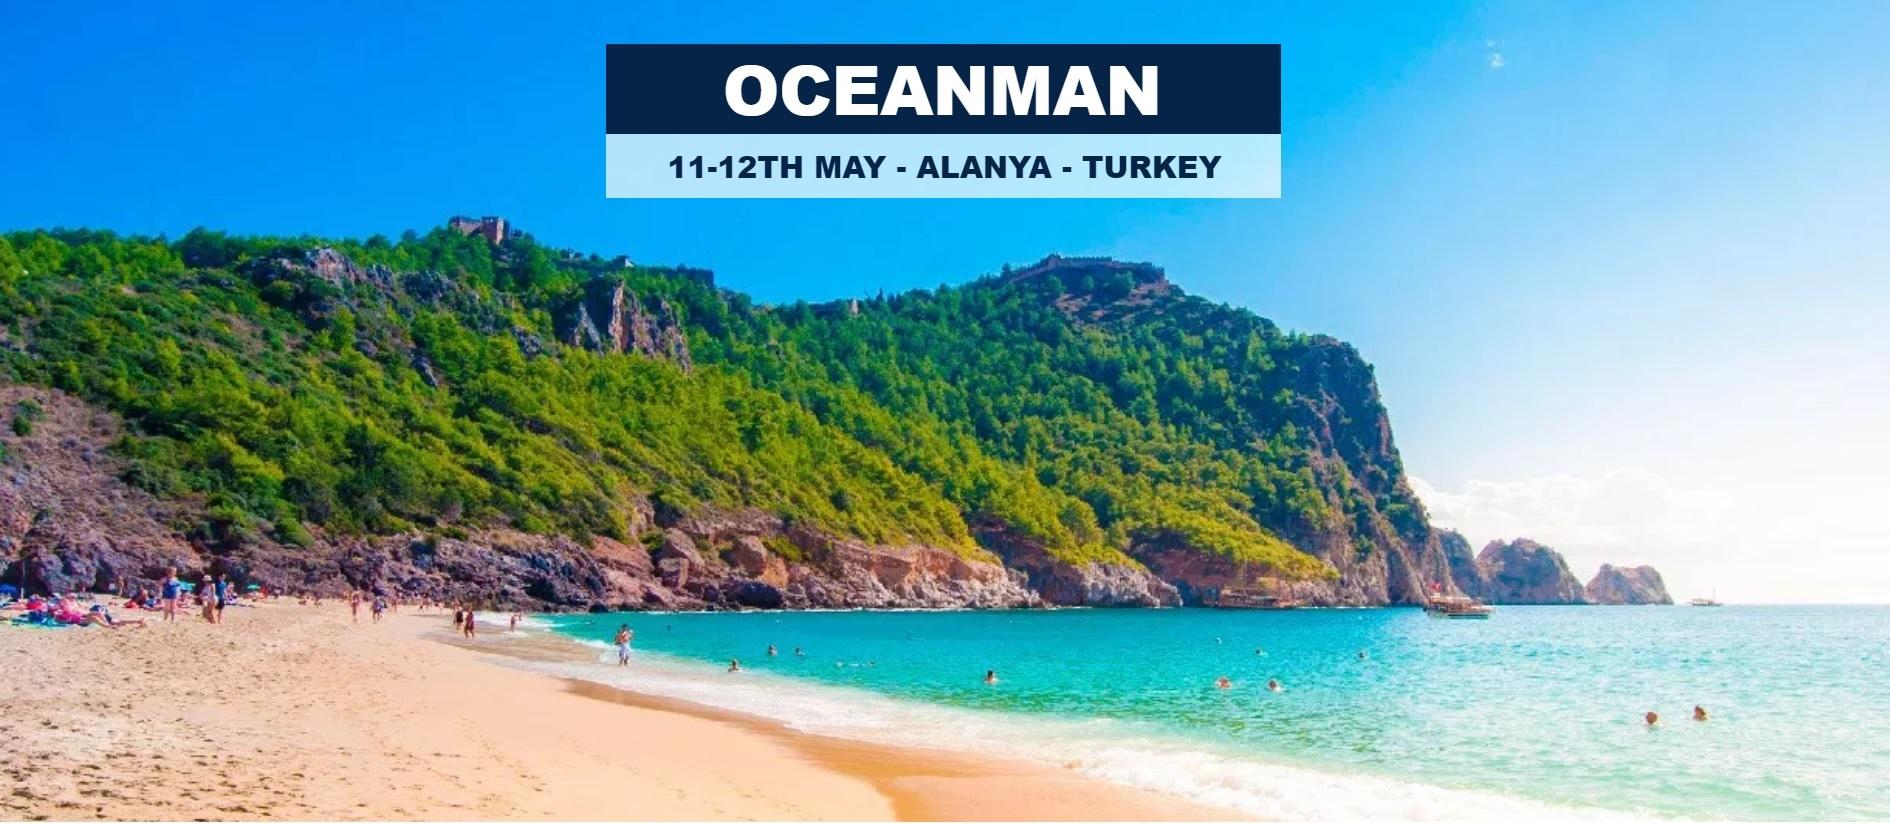 OCEANMAN ALANYA-TURKEY 19